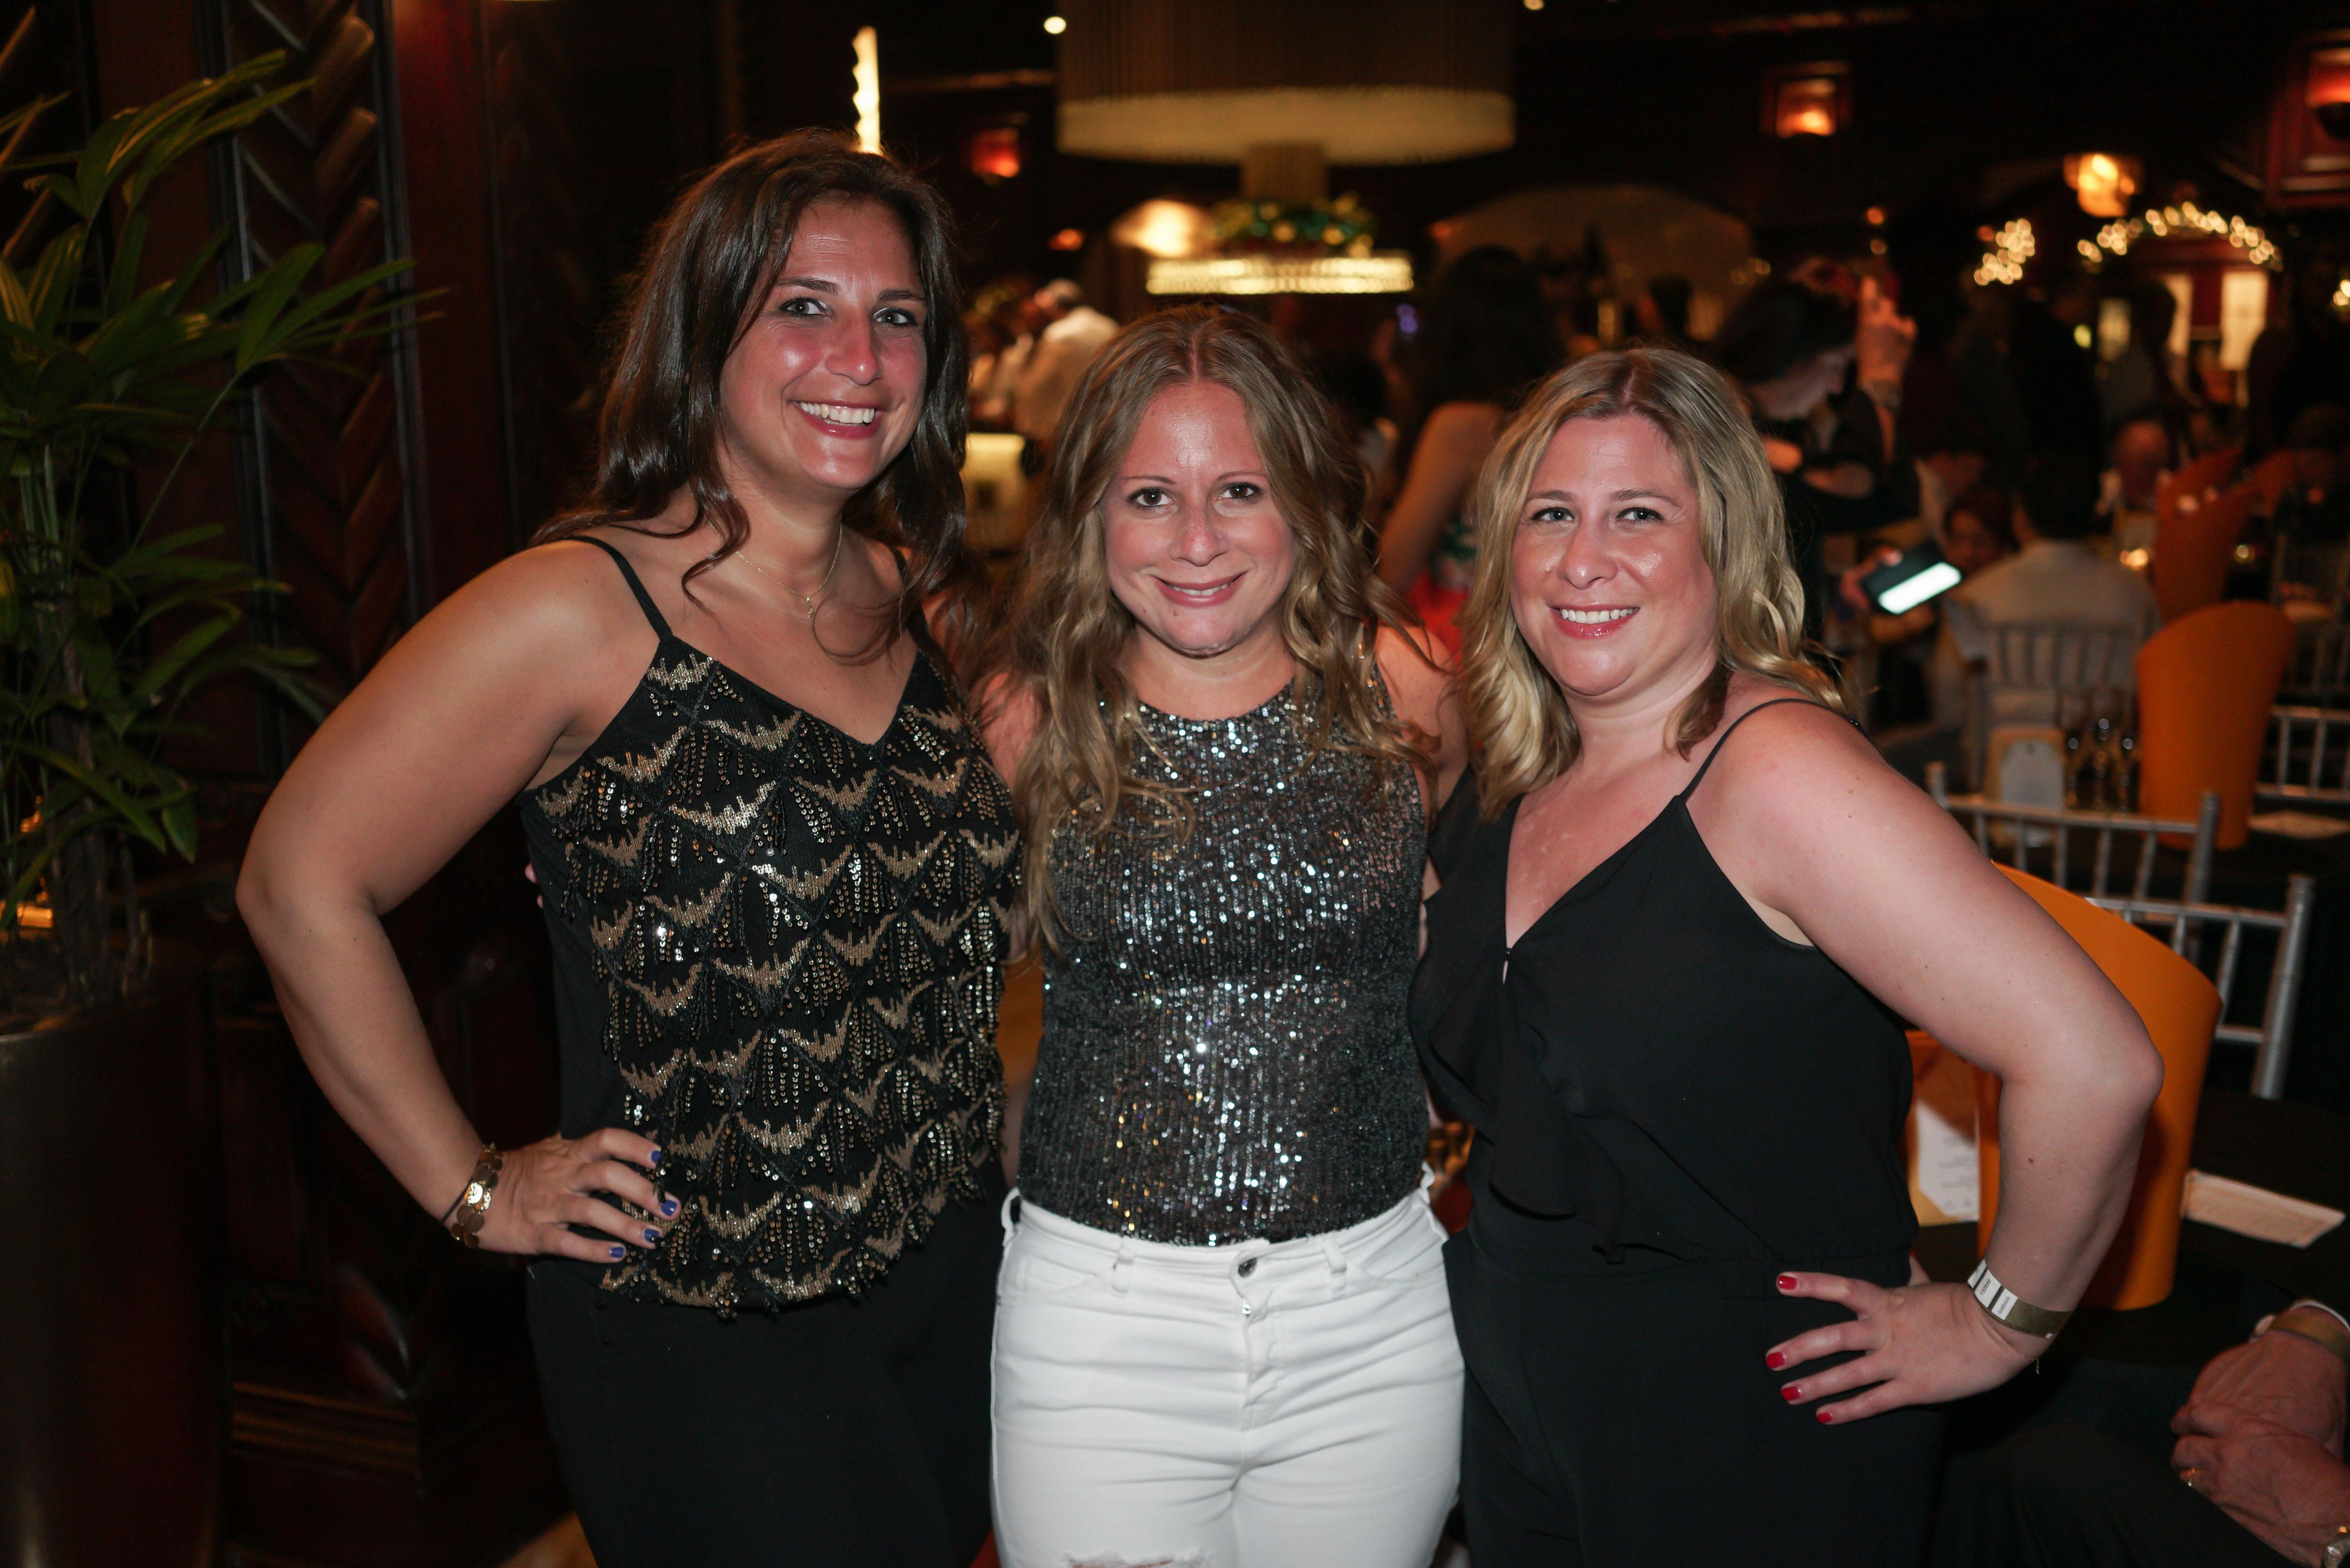 Amanda Levine, Cynthia Wachter y Lauren Schlussel. (Suministrada)